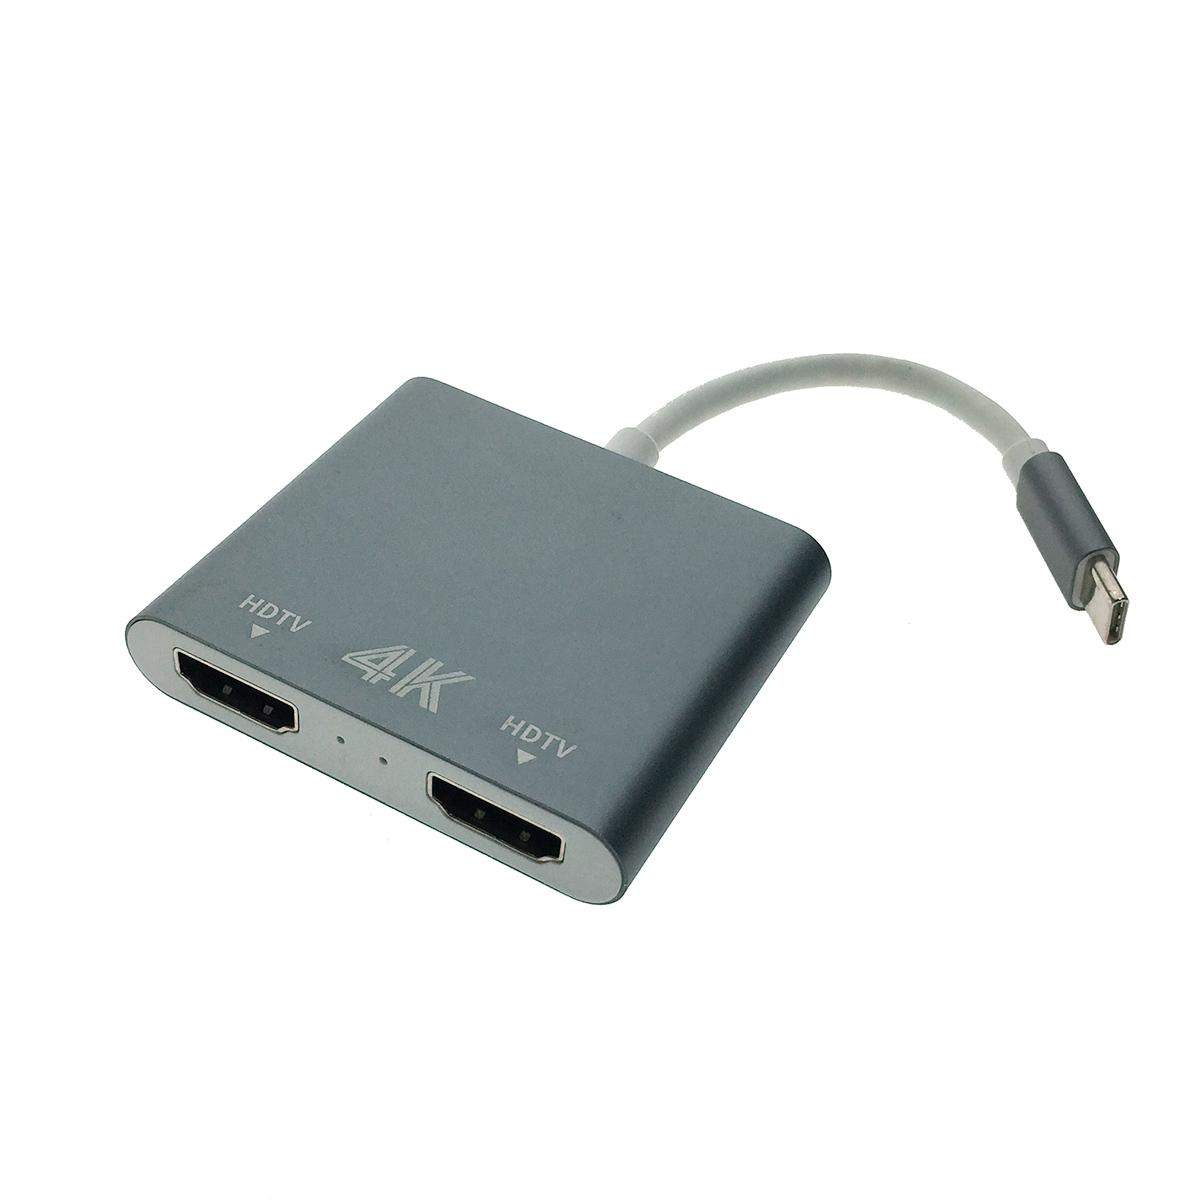 Видеоконвертер USB 3.1 type C to 2 * HDMI, EusbC2hdm 4K Espada